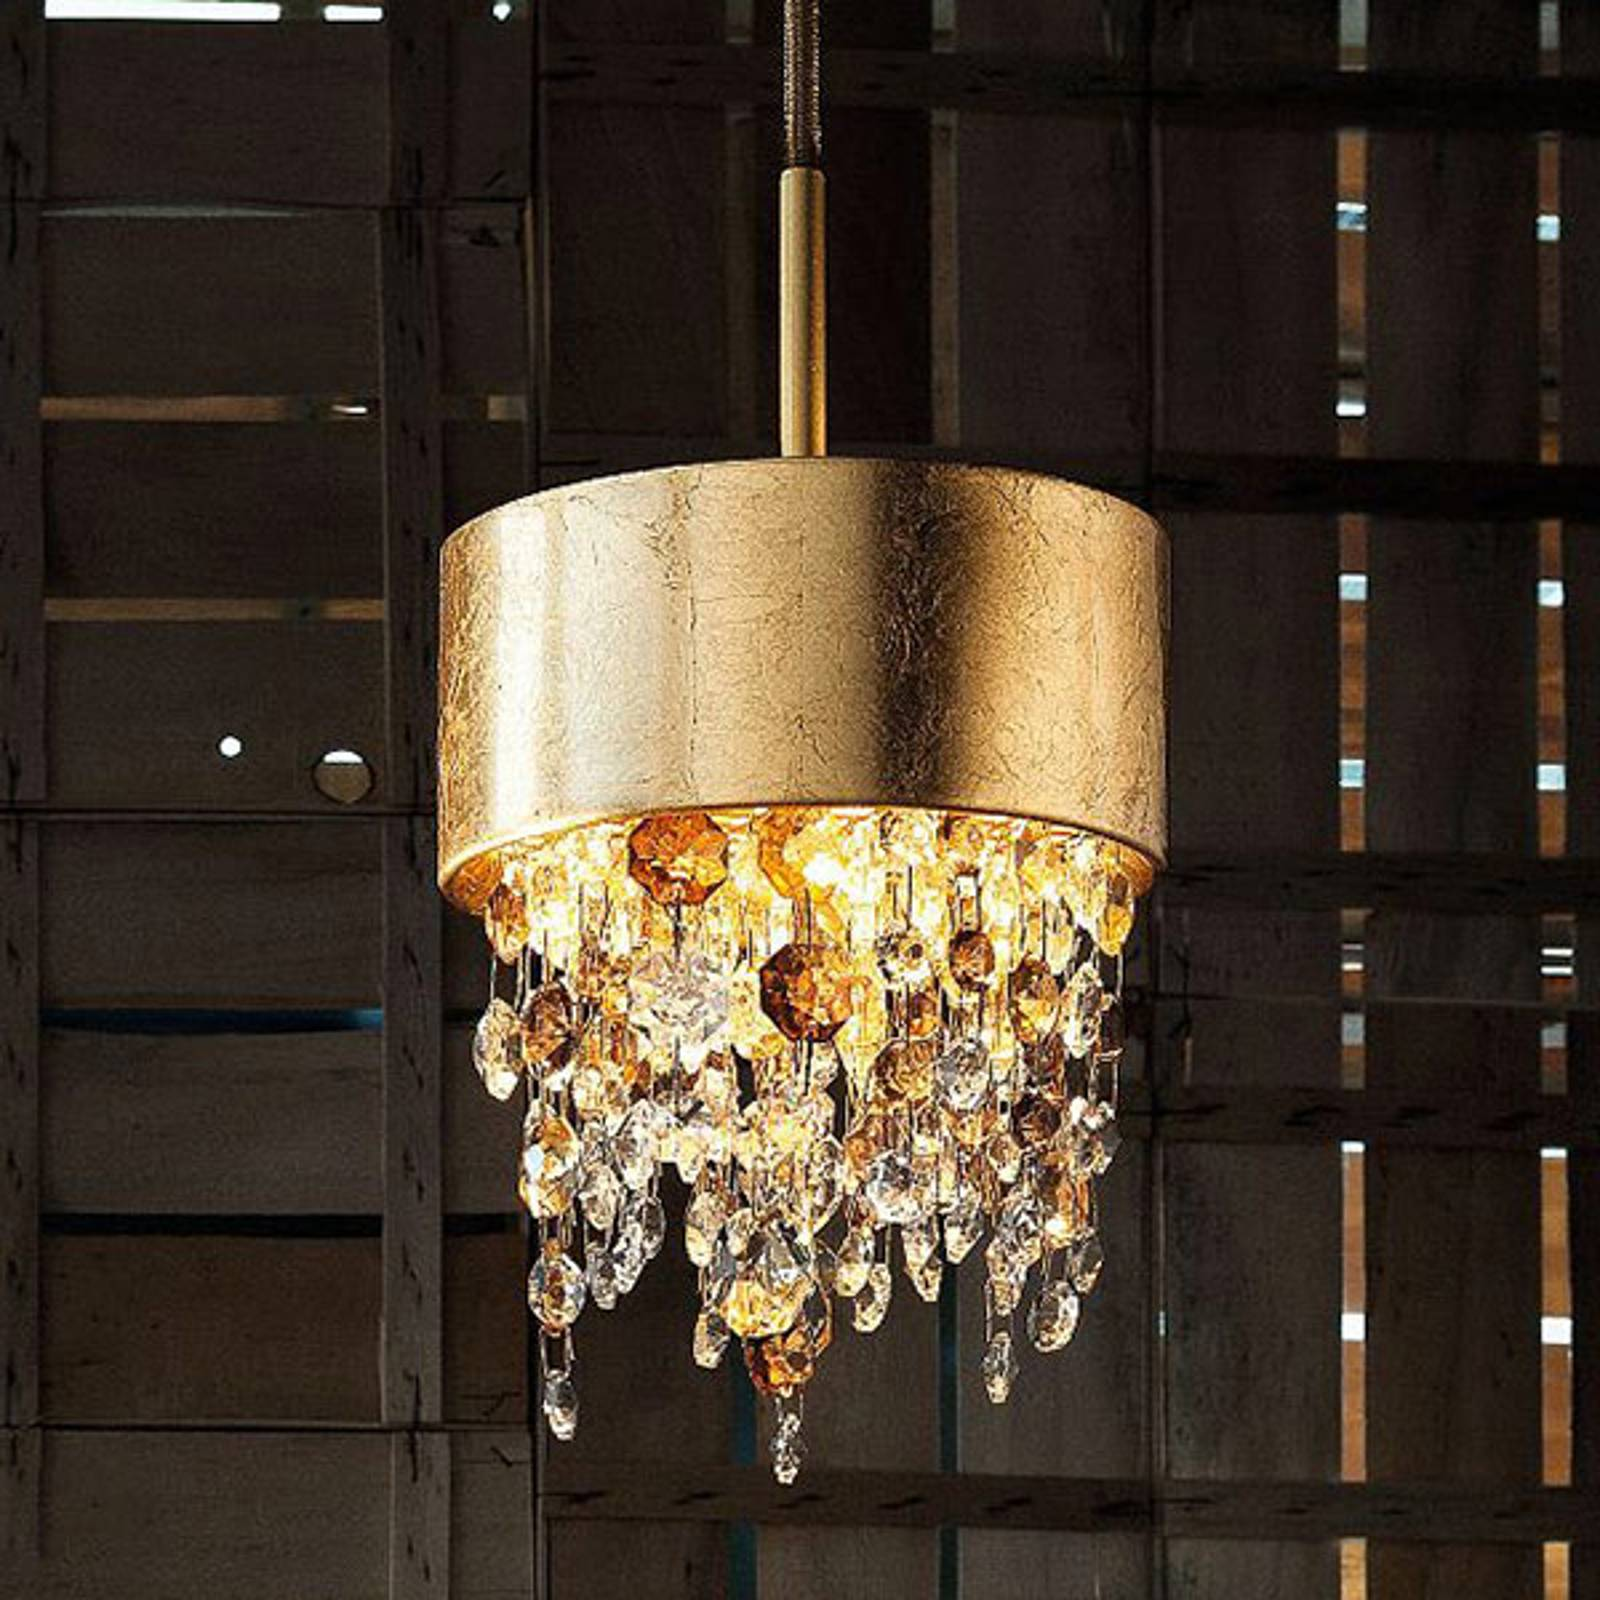 LED hanglamp Olà S2 15, Ø15cm, bladgoud/amber